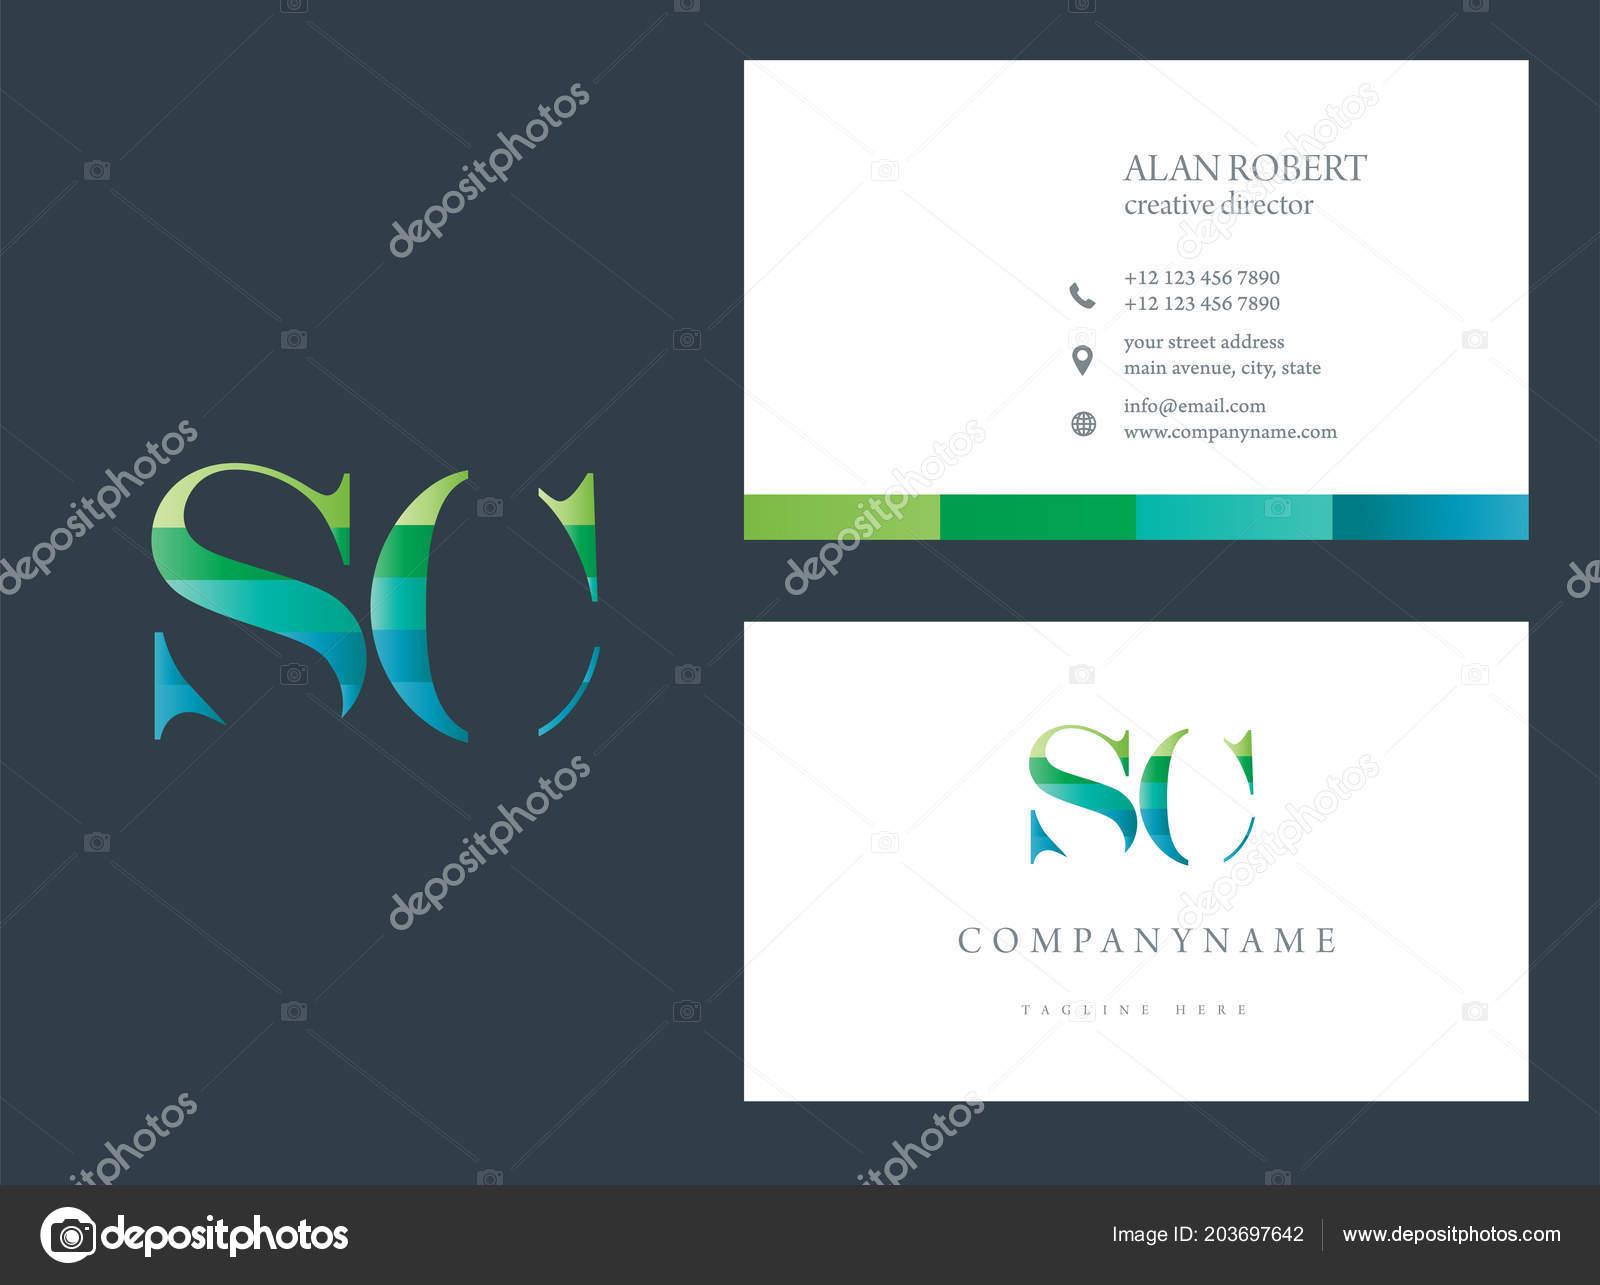 Label logo business card template blue color vetores de stock label logo business card template blue color vetores de stock reheart Choice Image